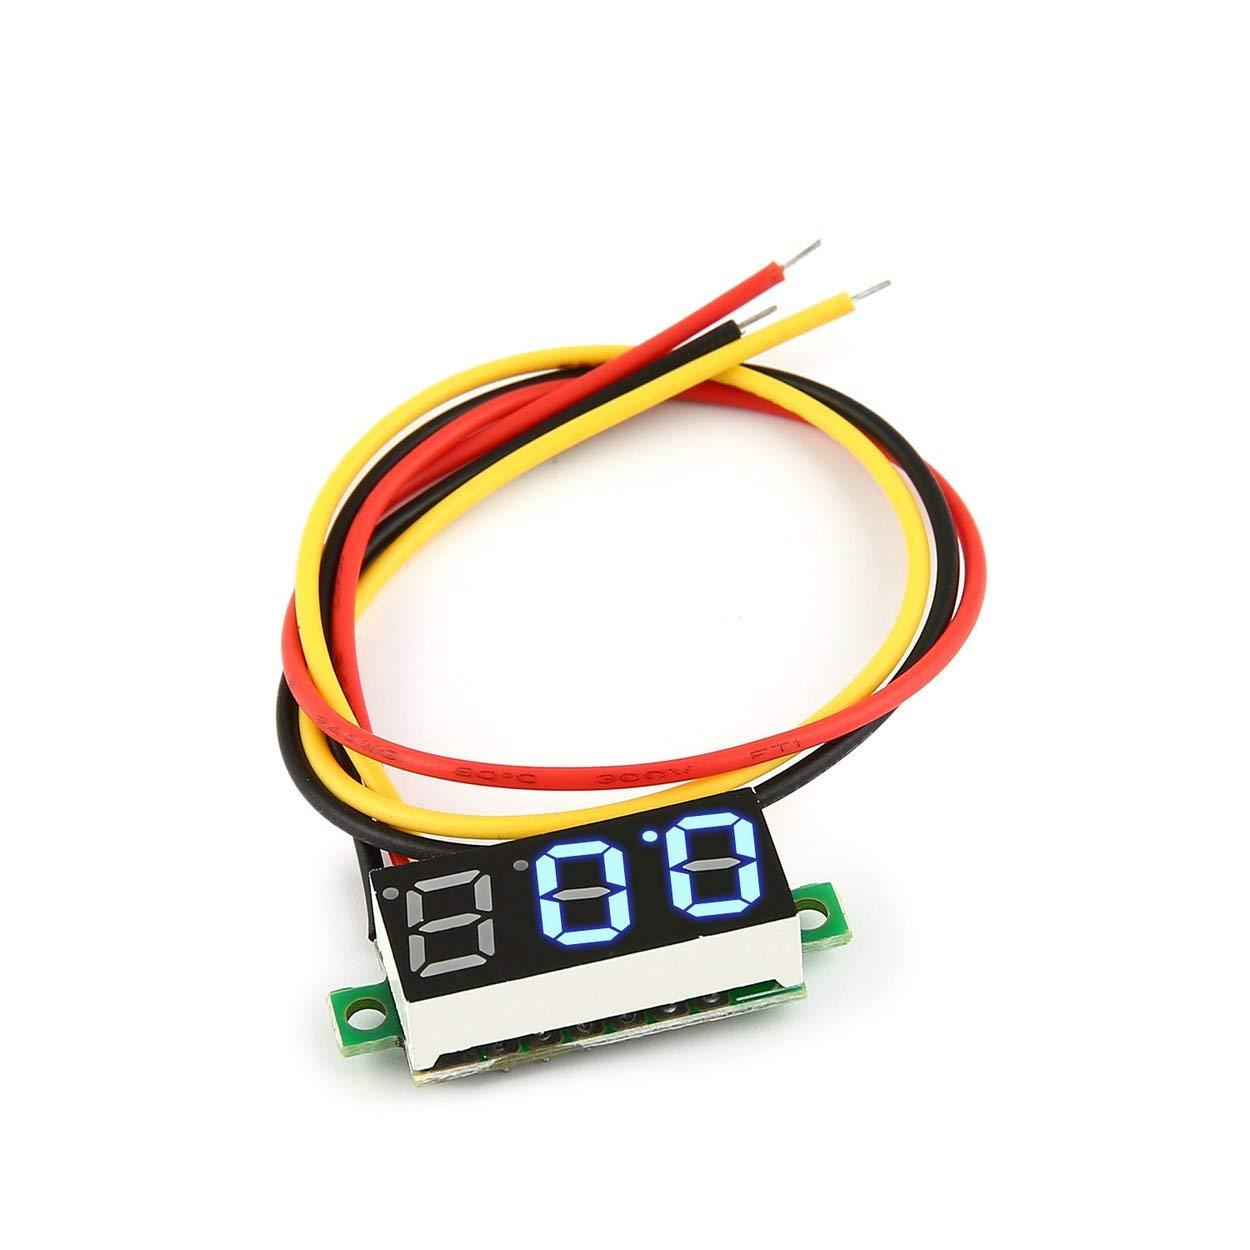 Lorenlli 0-100V 0.28in 3 Wire LED Digital Display Panel Voltmeter Electric Voltage Meter Volt Tester for Auto Battery Car Motorcycle